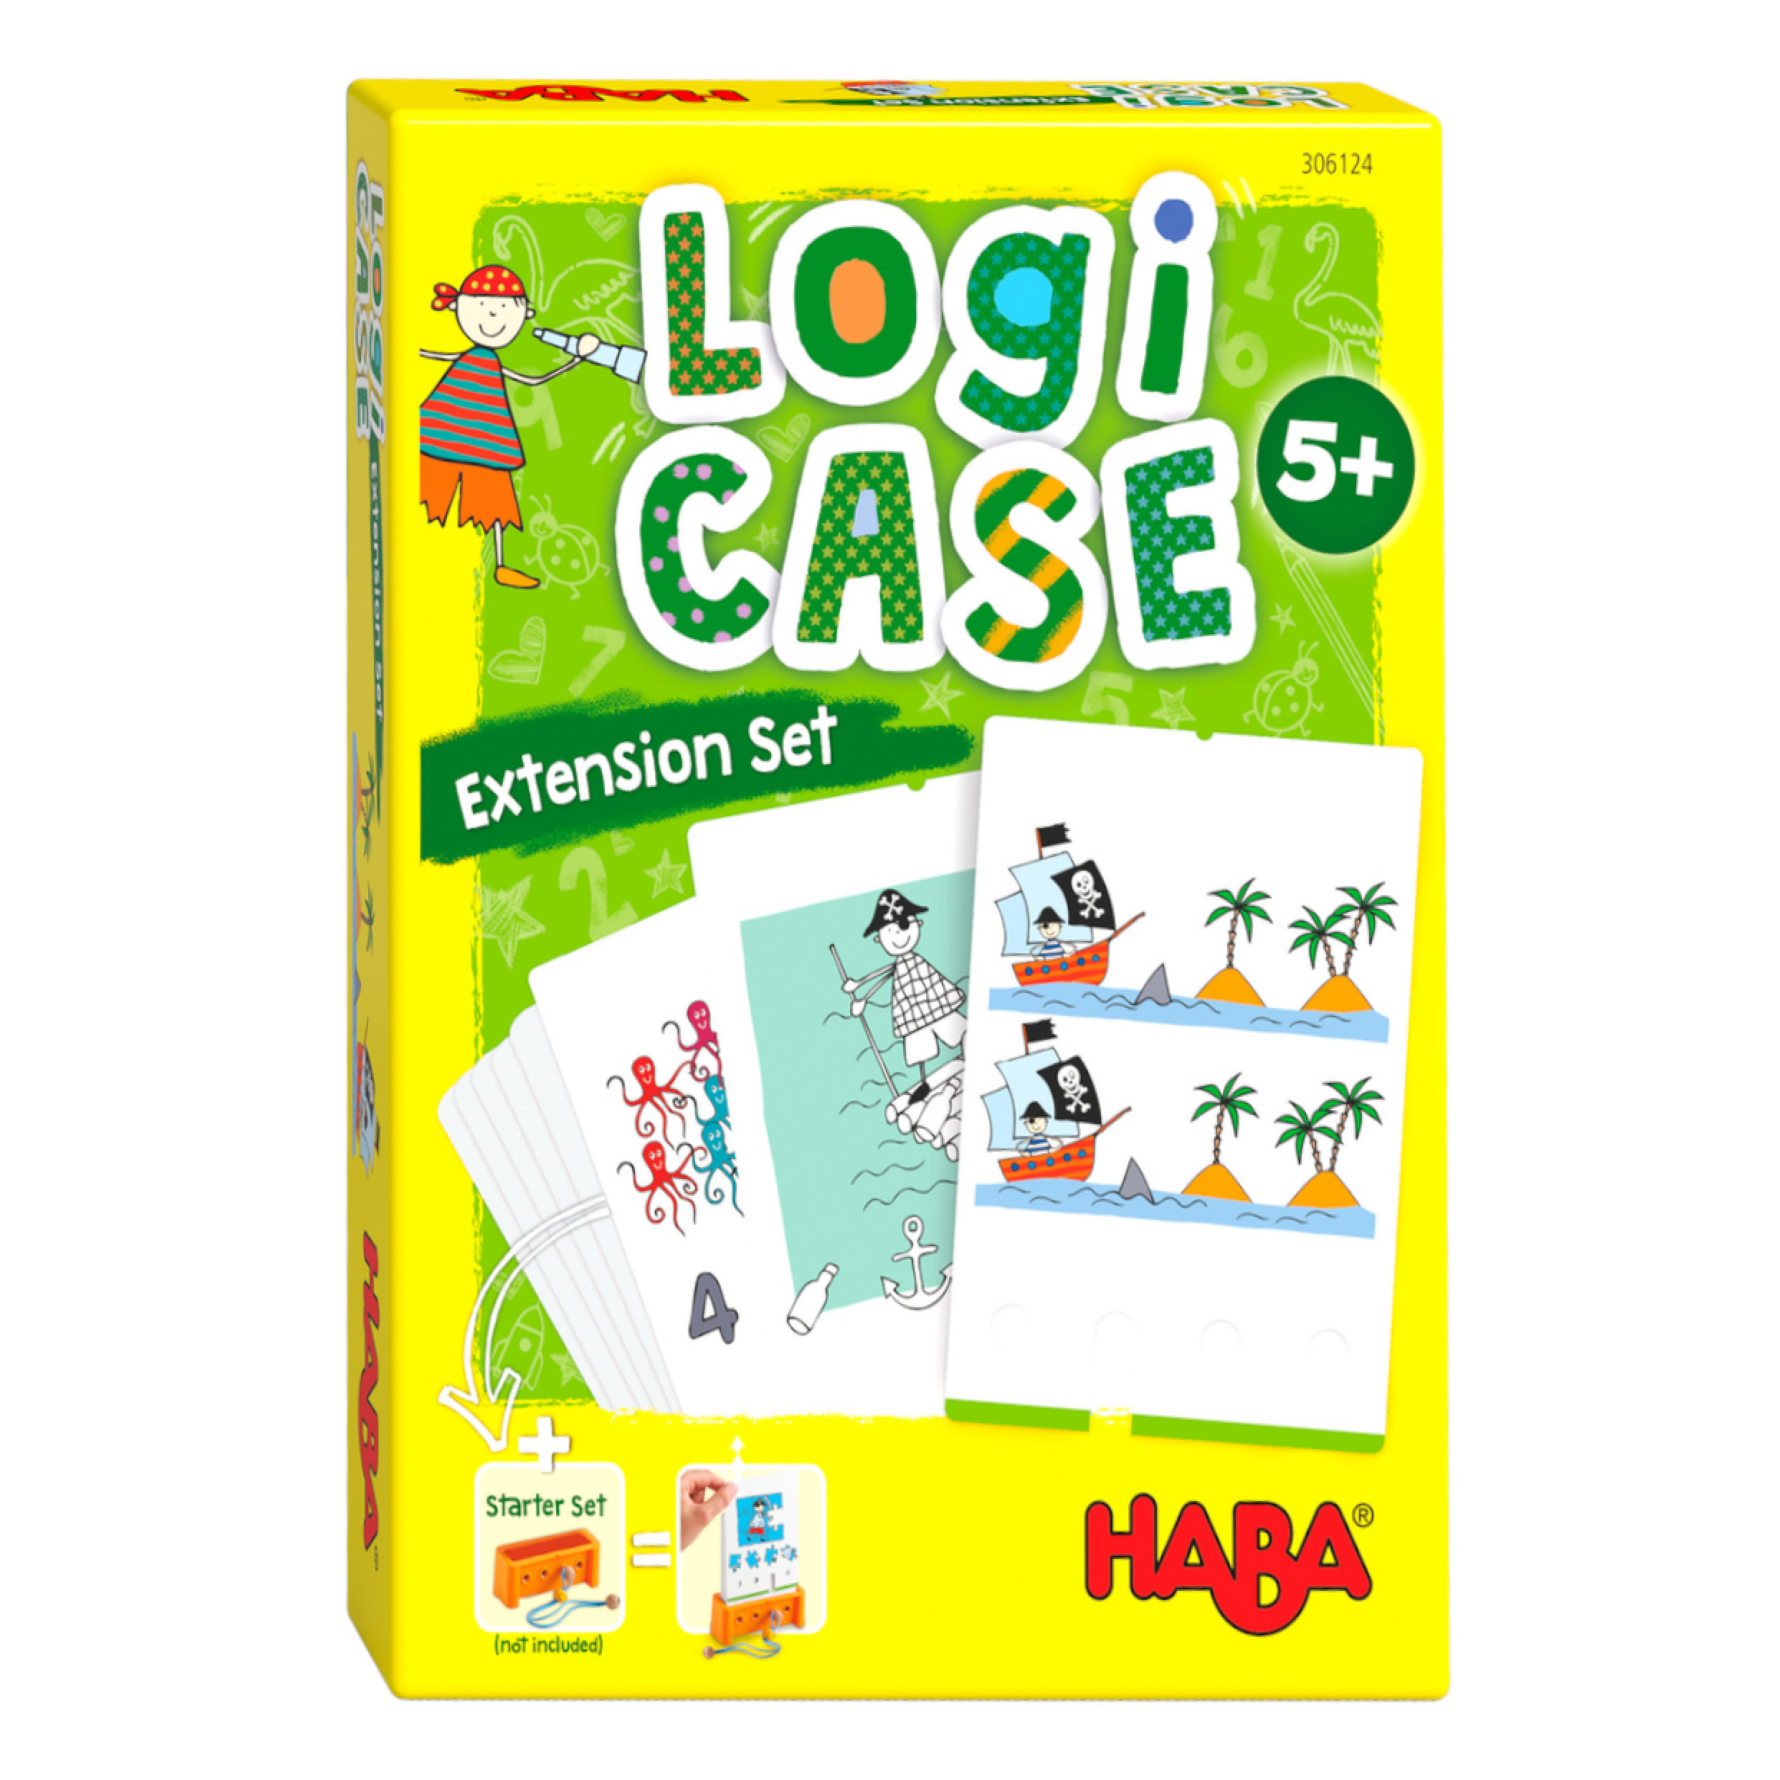 Spel - LogiCASE - Piraten - Uitbreidingsset - 5+